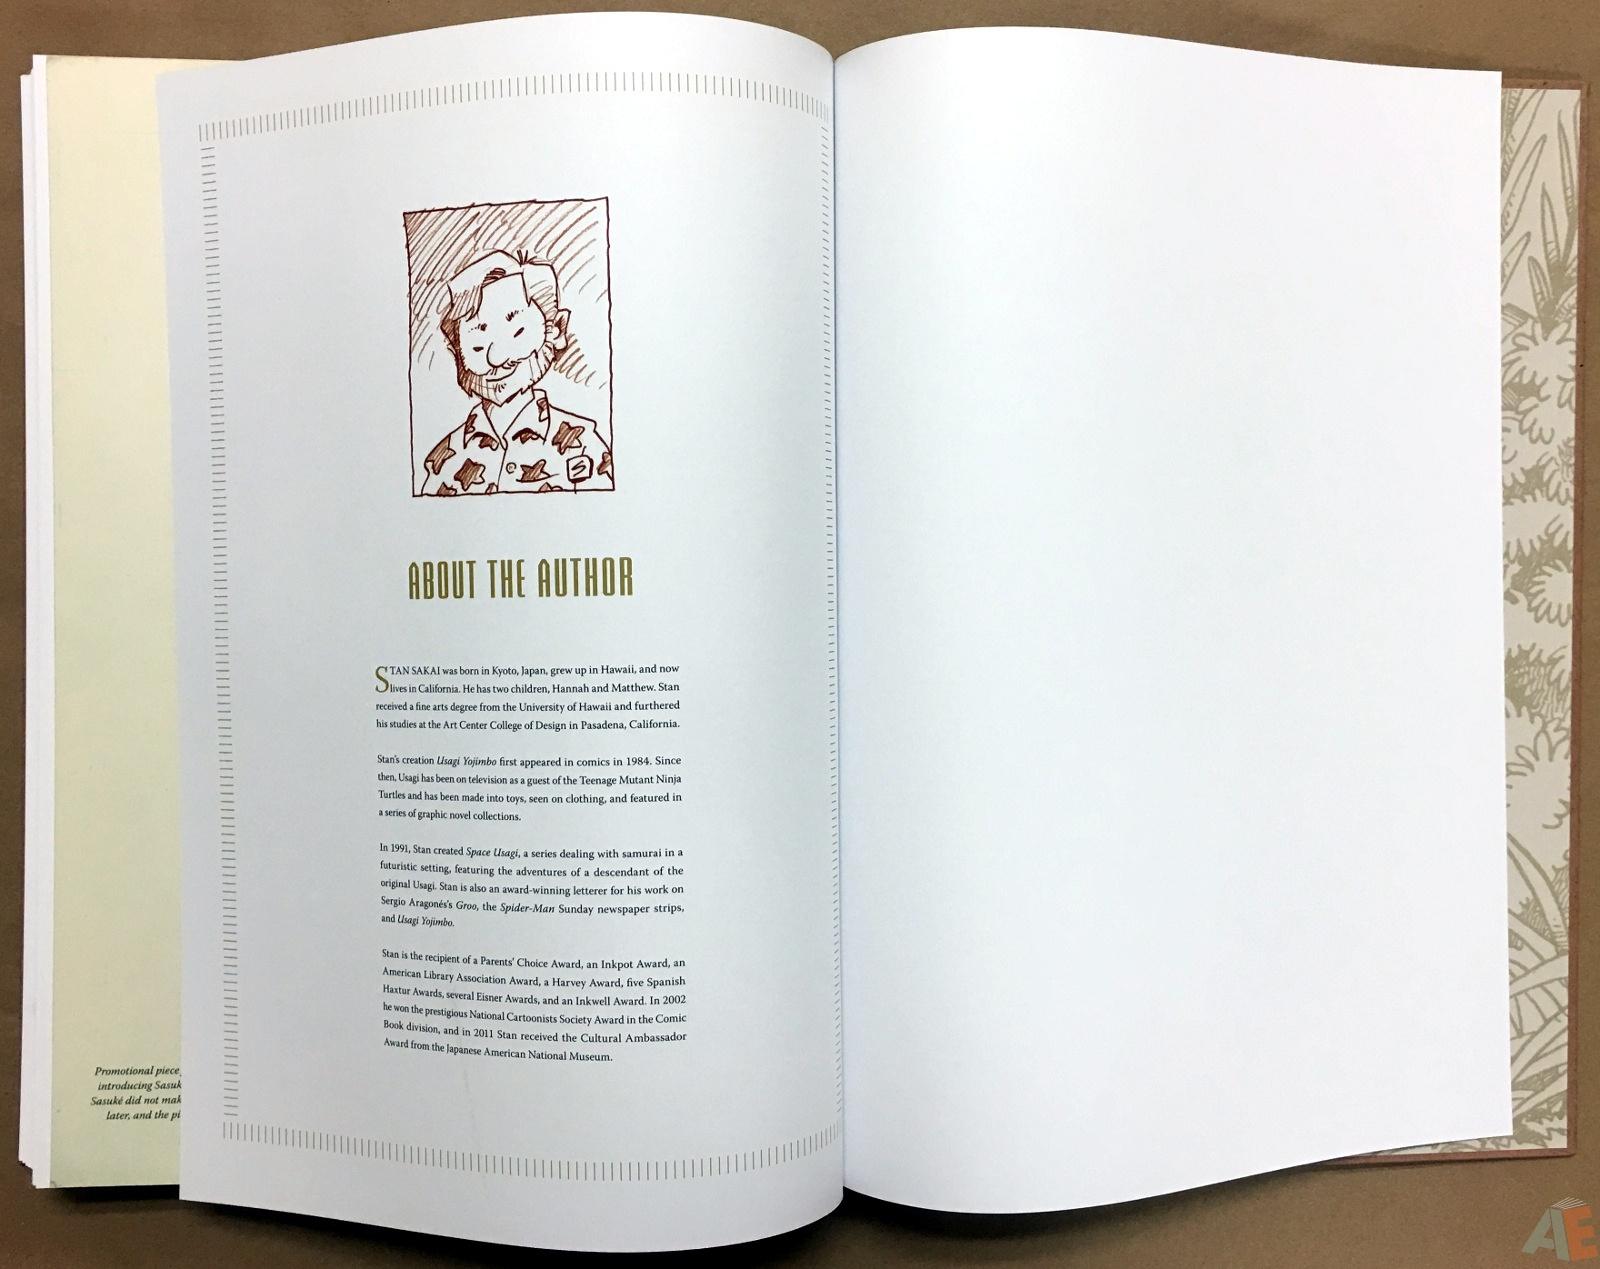 Usagi Yojimbo: Samurai and Other Stories Gallery Edition 50